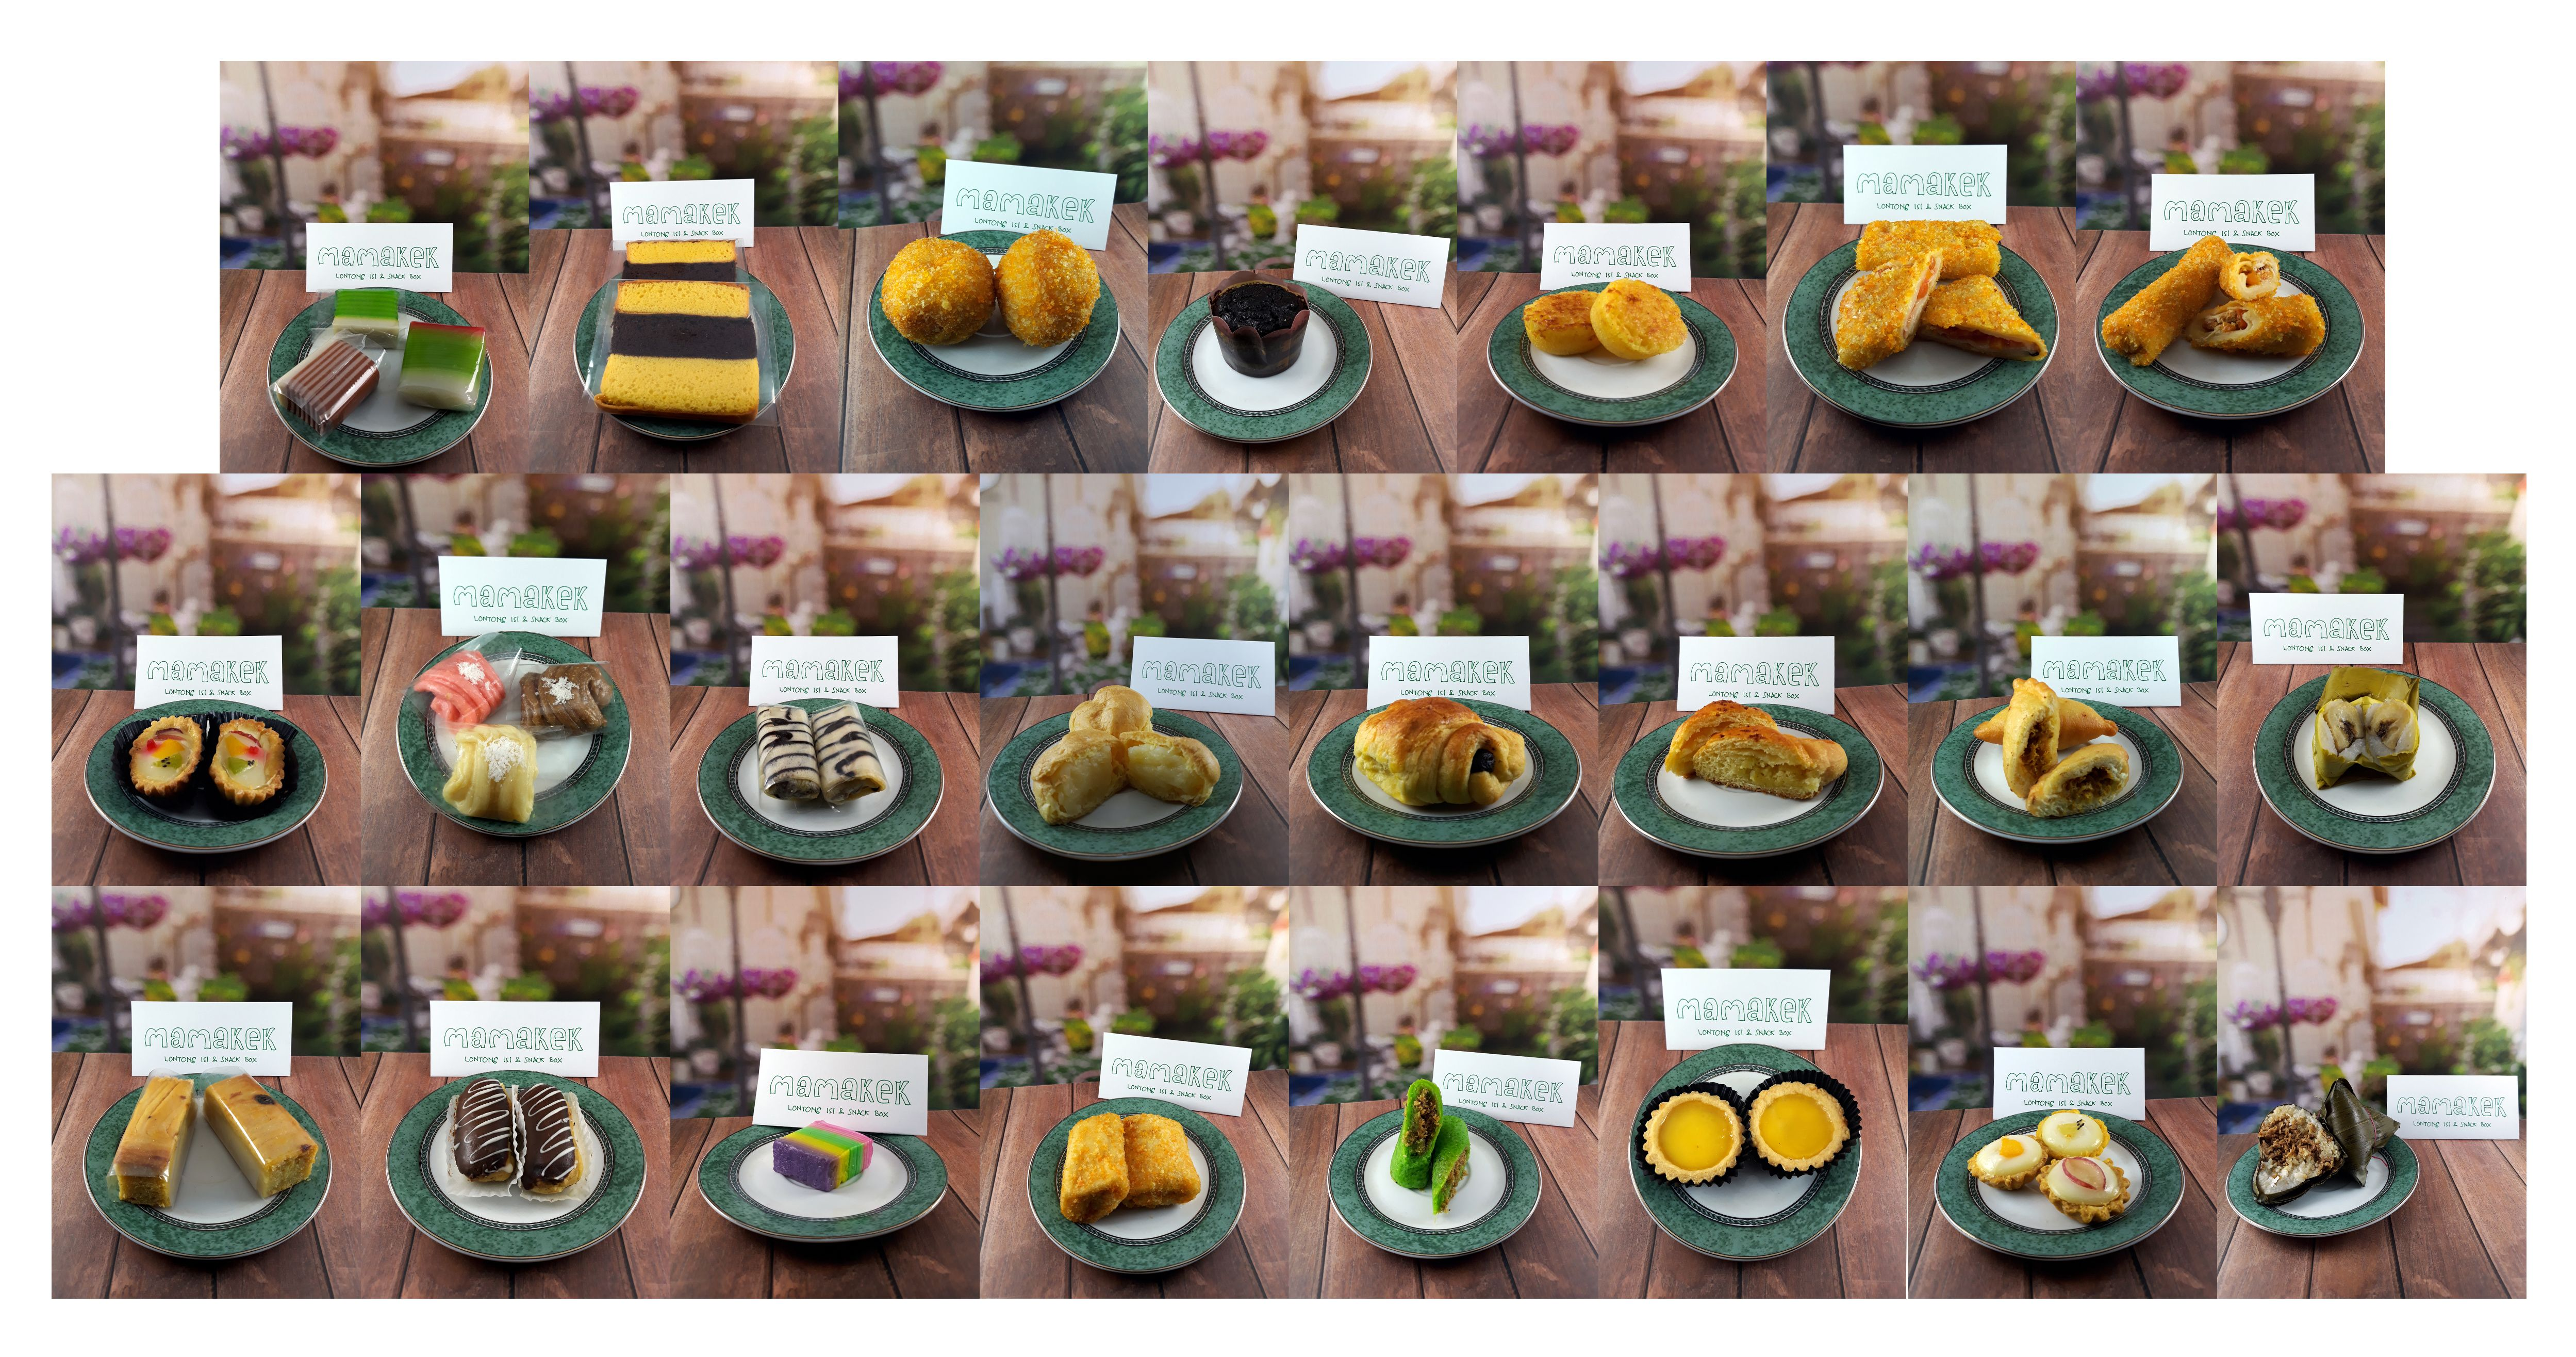 Menyediakan Snack Box Kue Jajanan Pasar Rasa Kue Enak Higienis